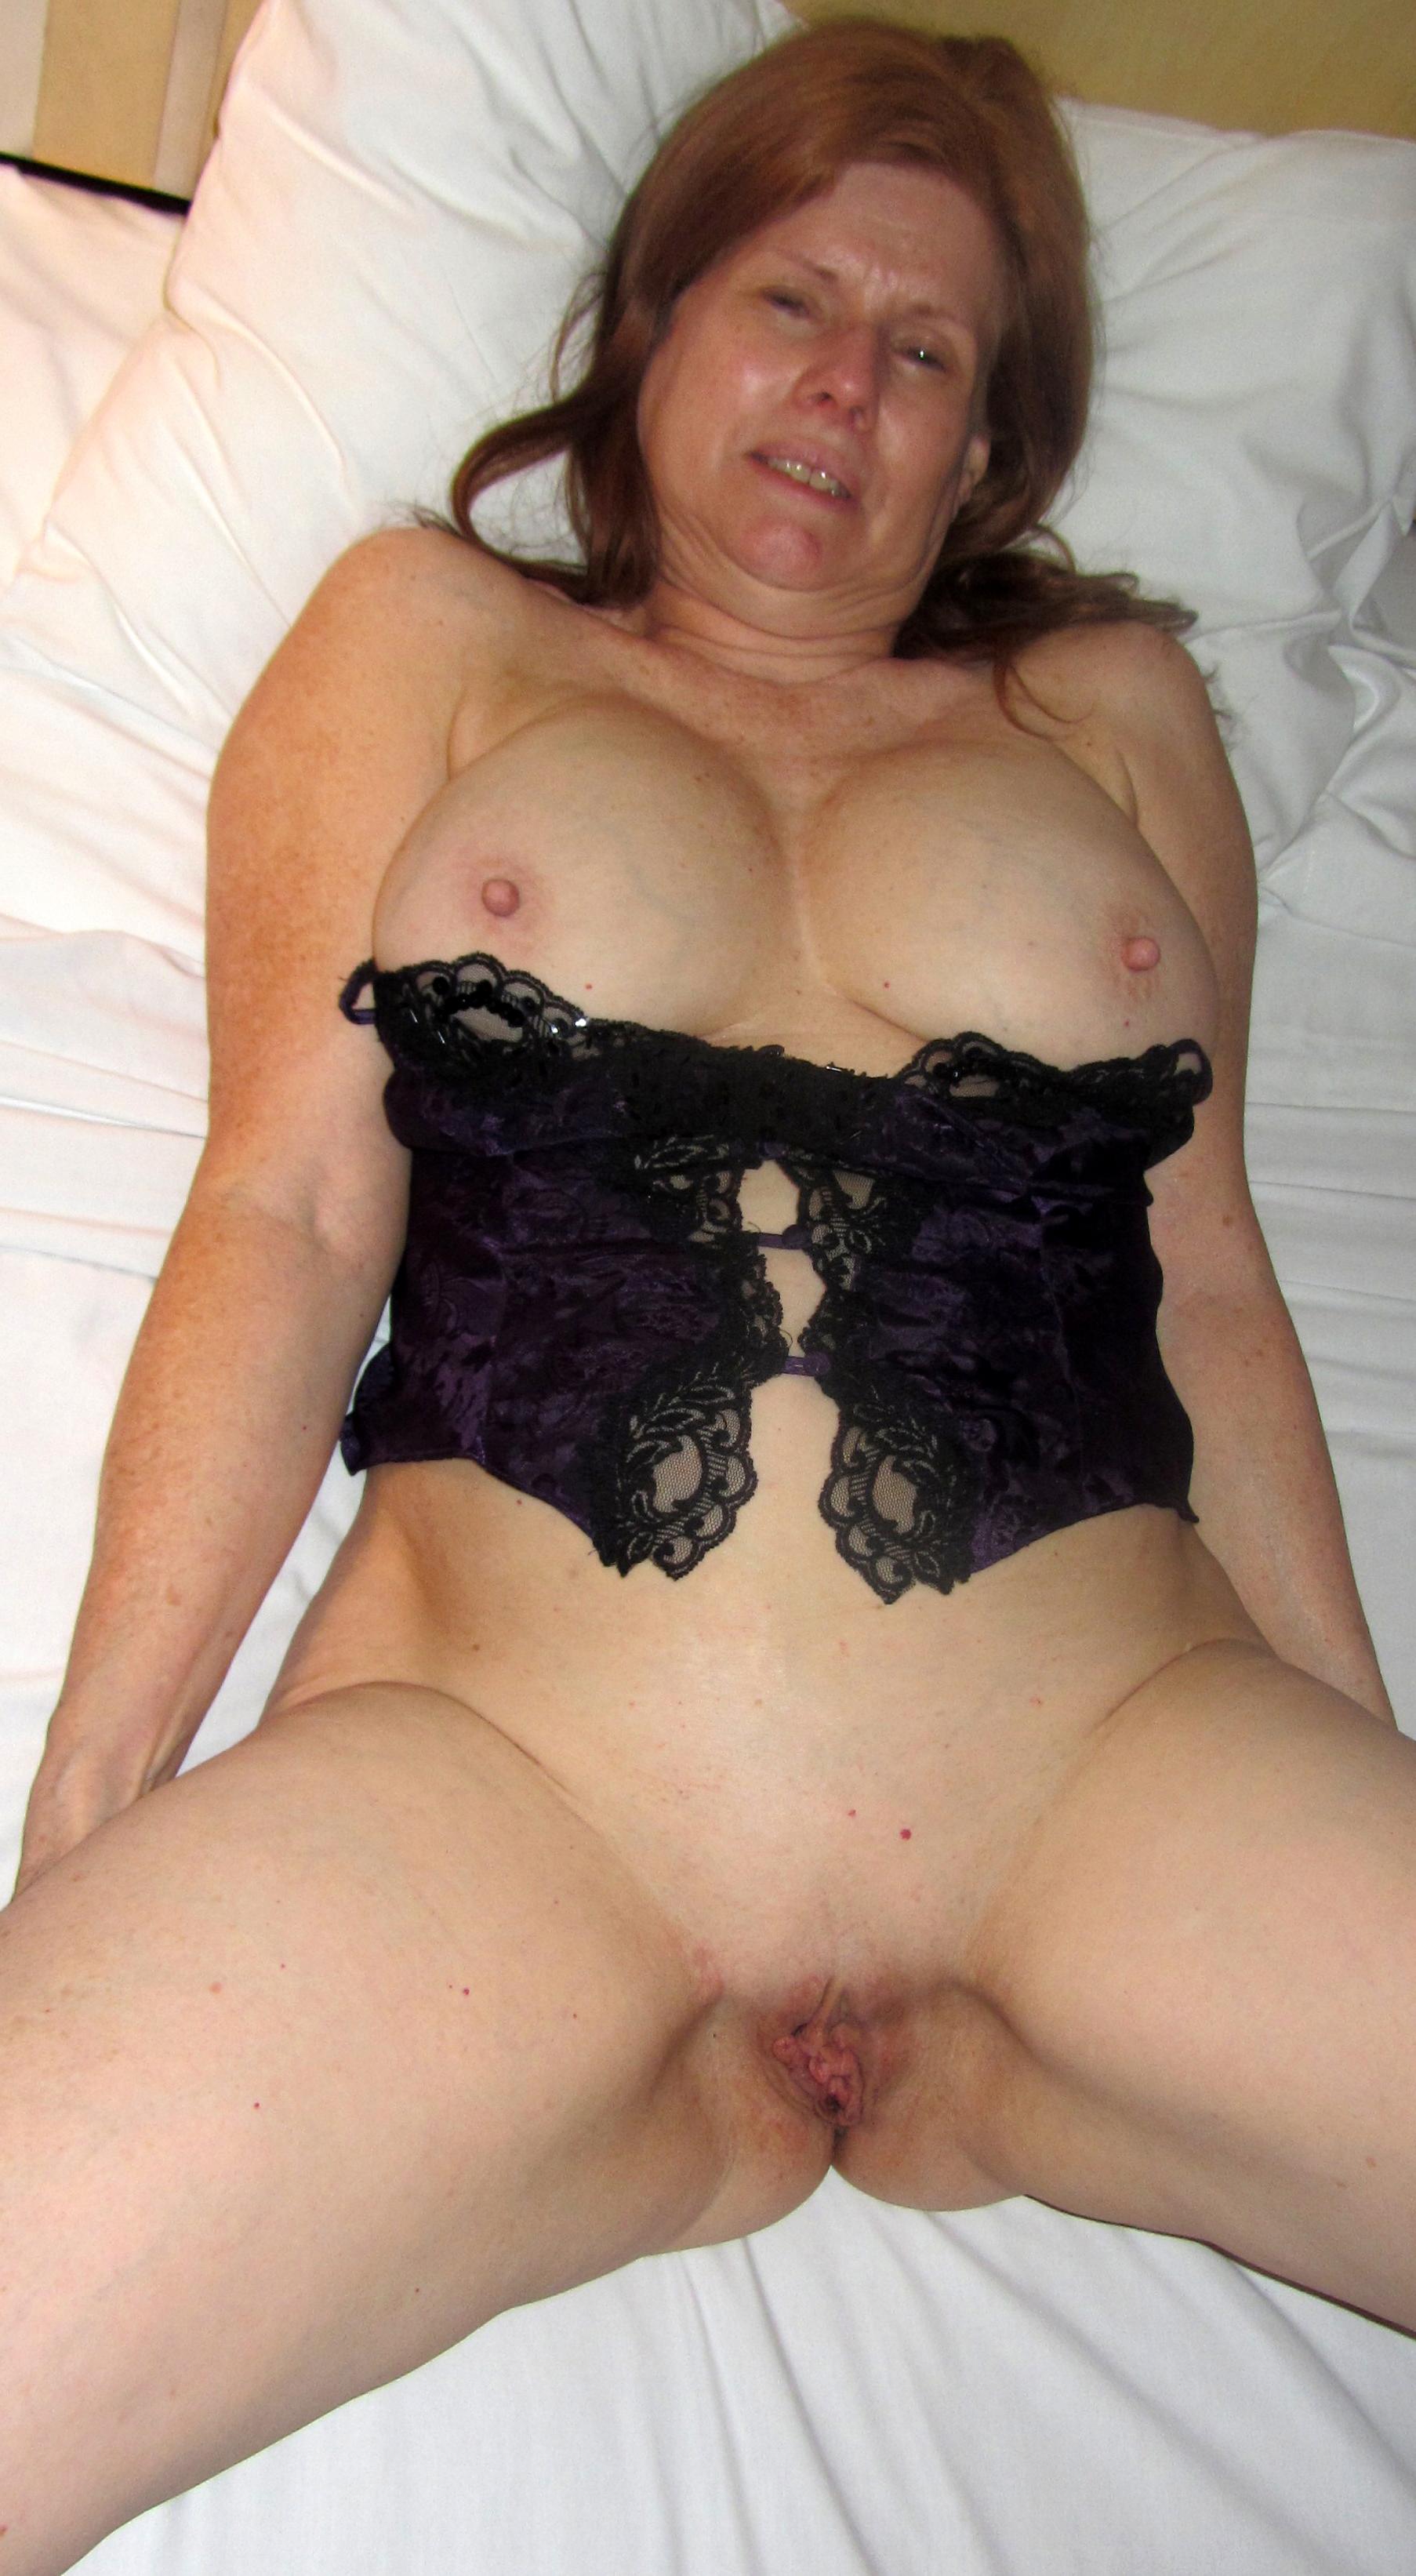 amature starkers granny pussy pics